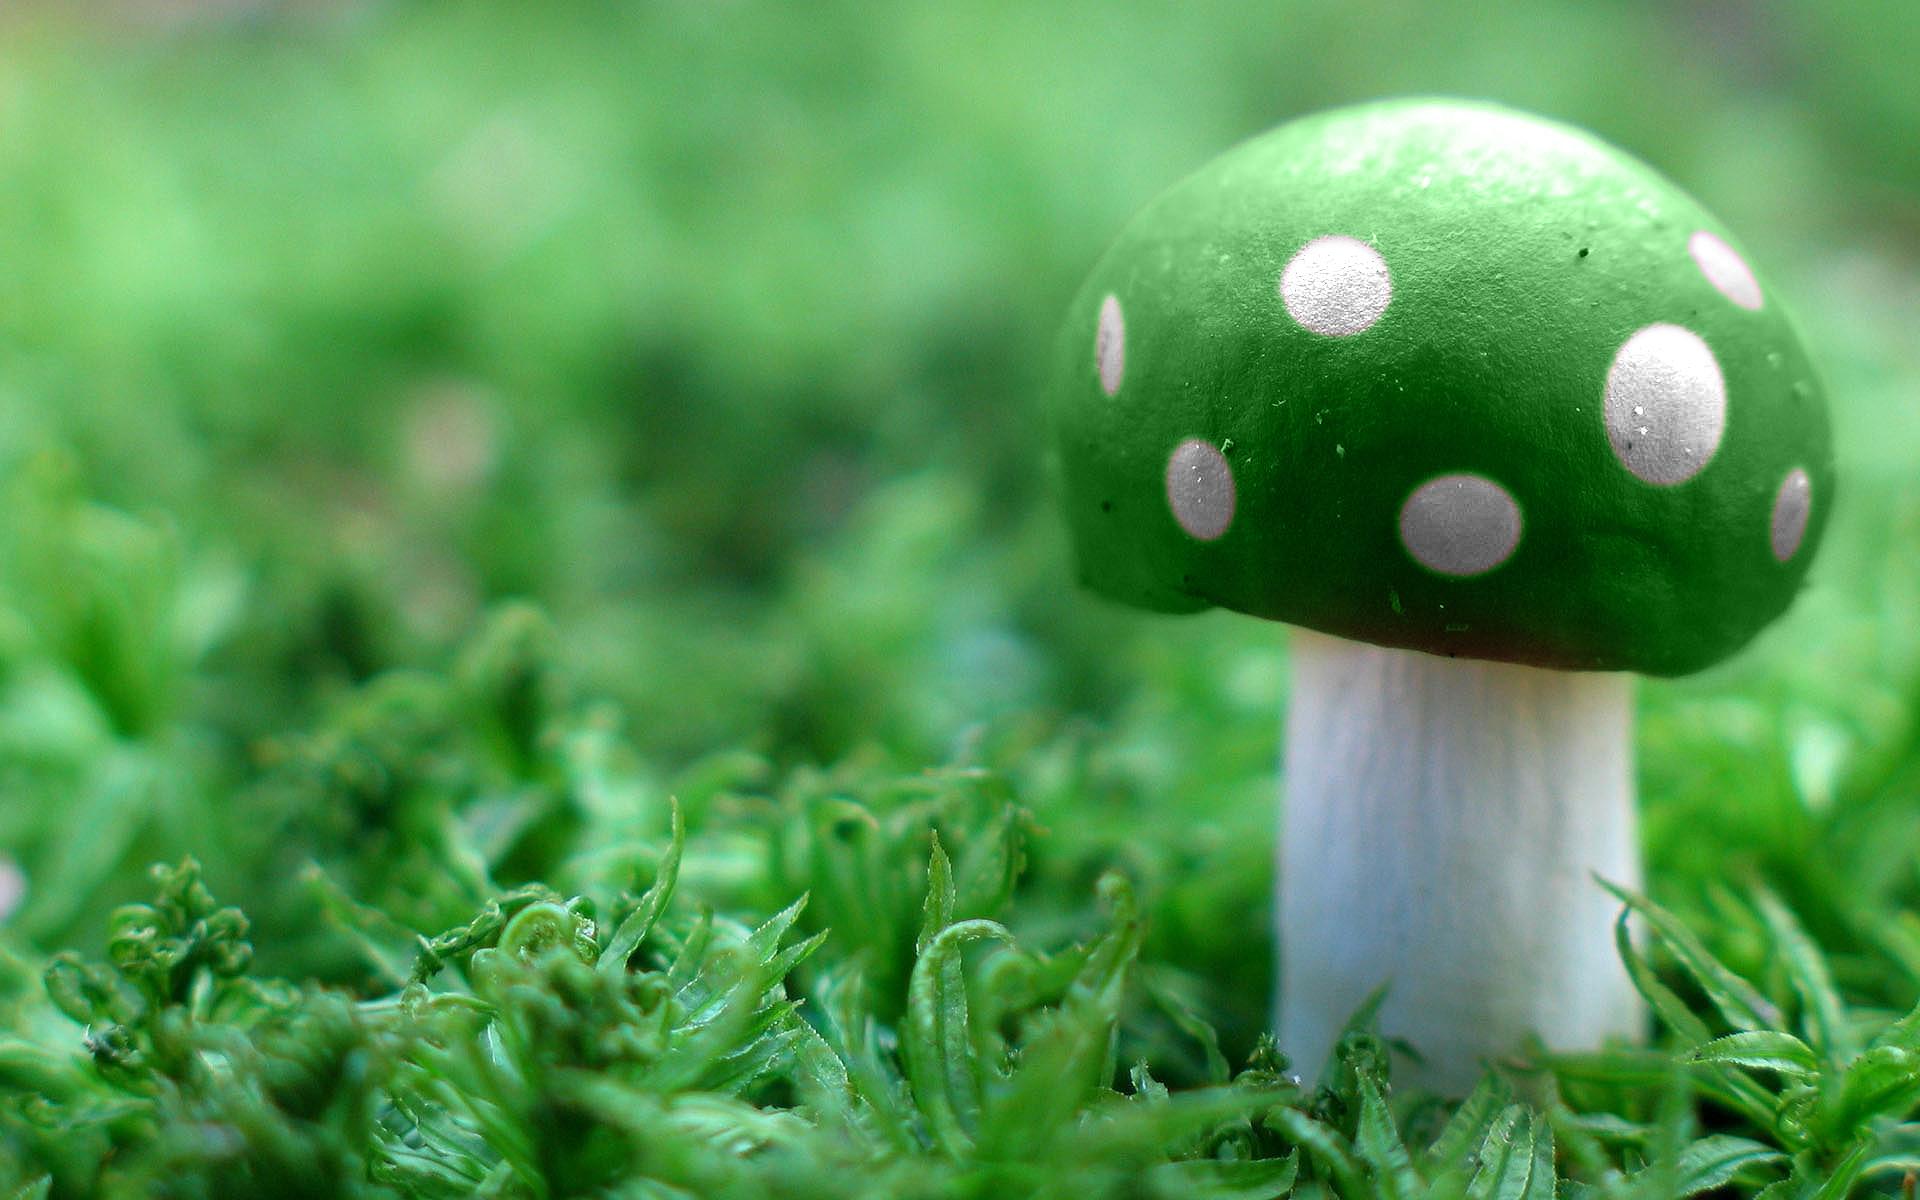 Wallpaper Monster Inc 3d Green Images Green Mushroom Hd Wallpaper And Background